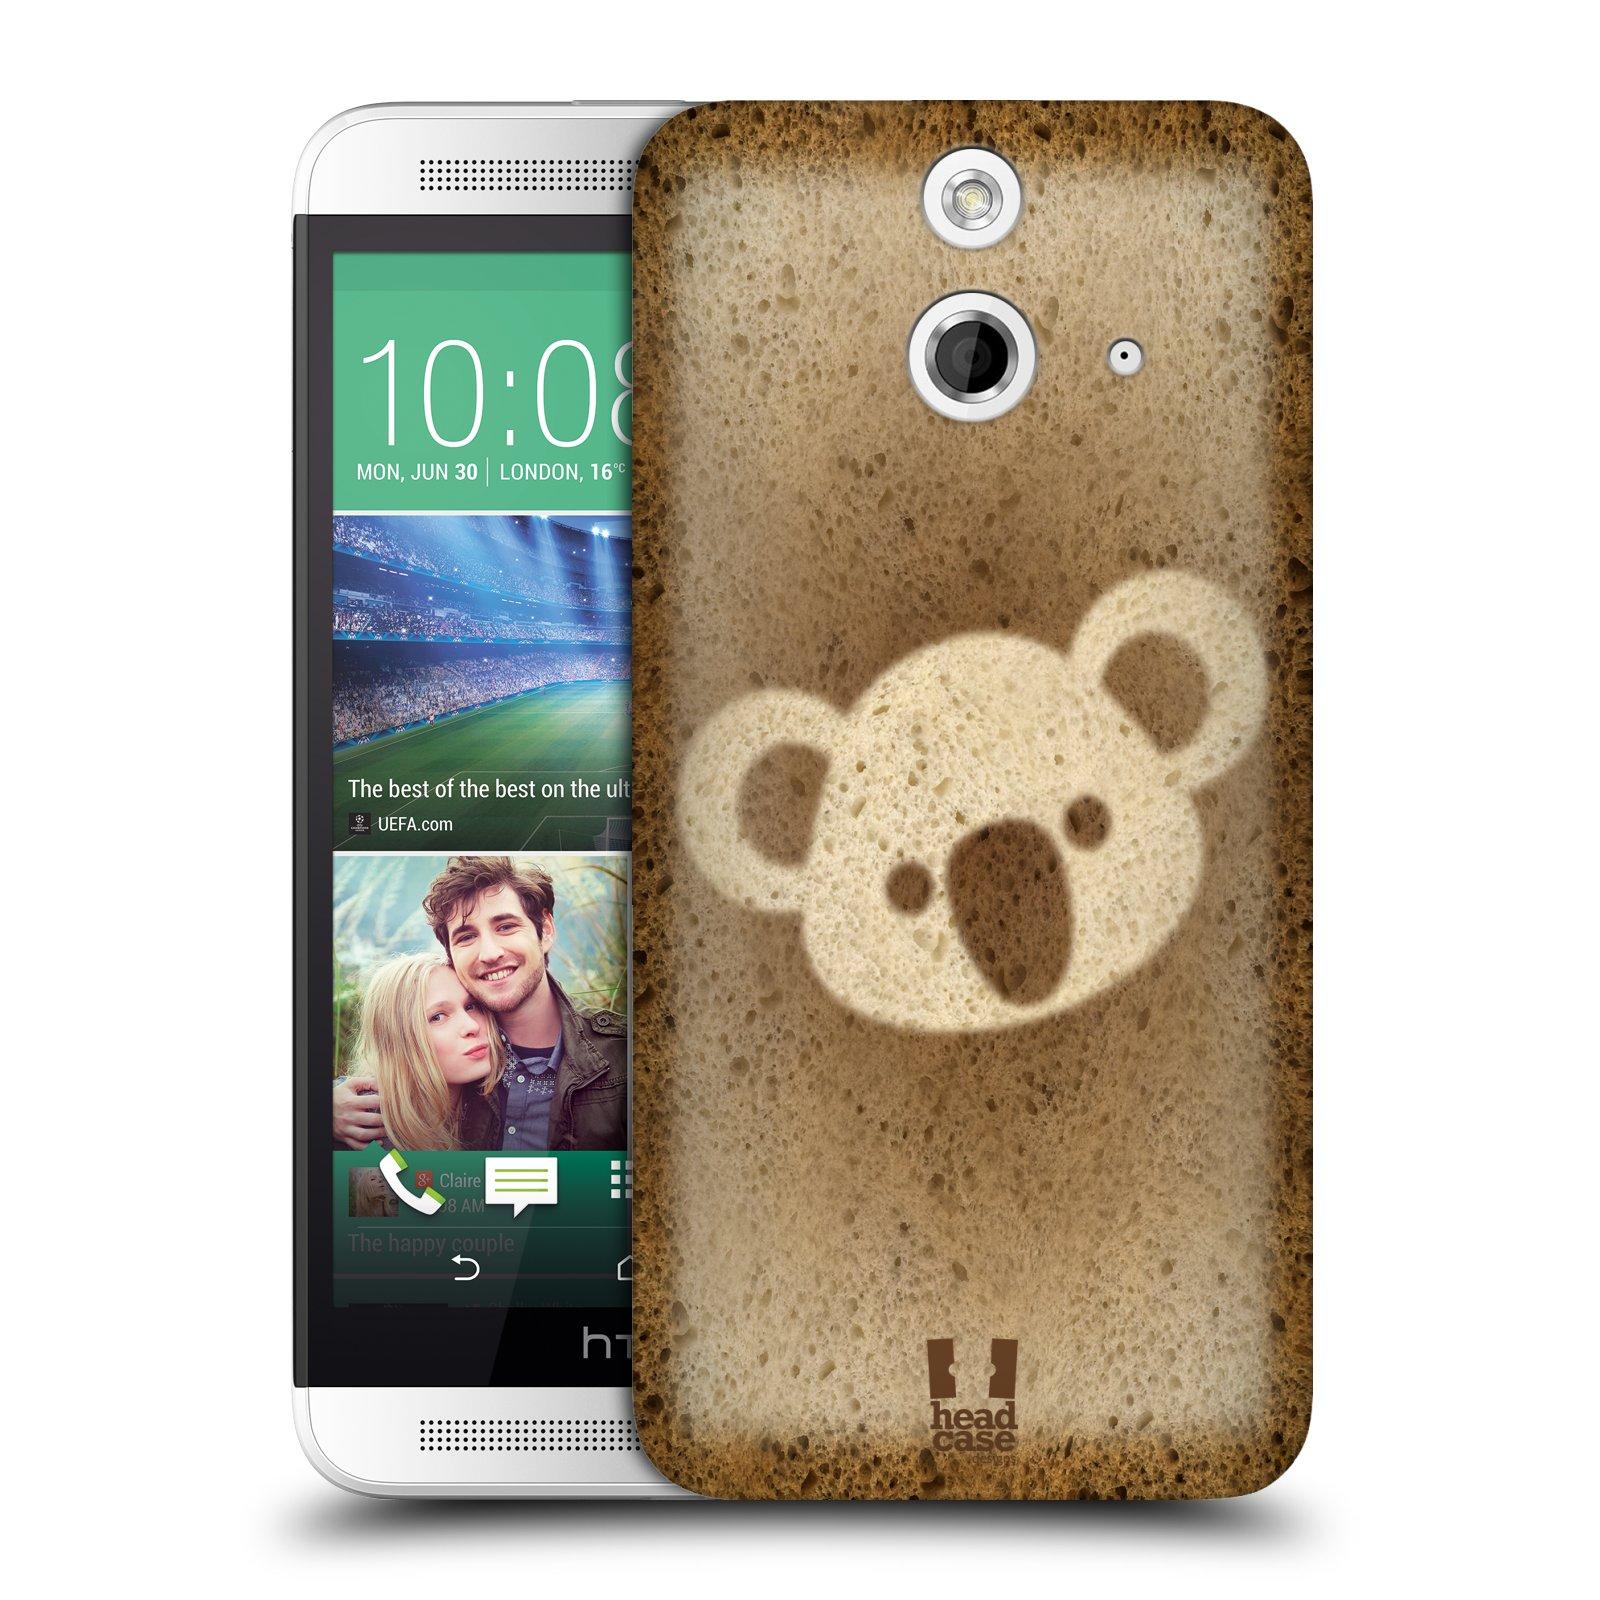 HEAD CASE DESIGNS BREAD ART HARD BACK CASE FOR HTC ONE E8 DUAL SIM